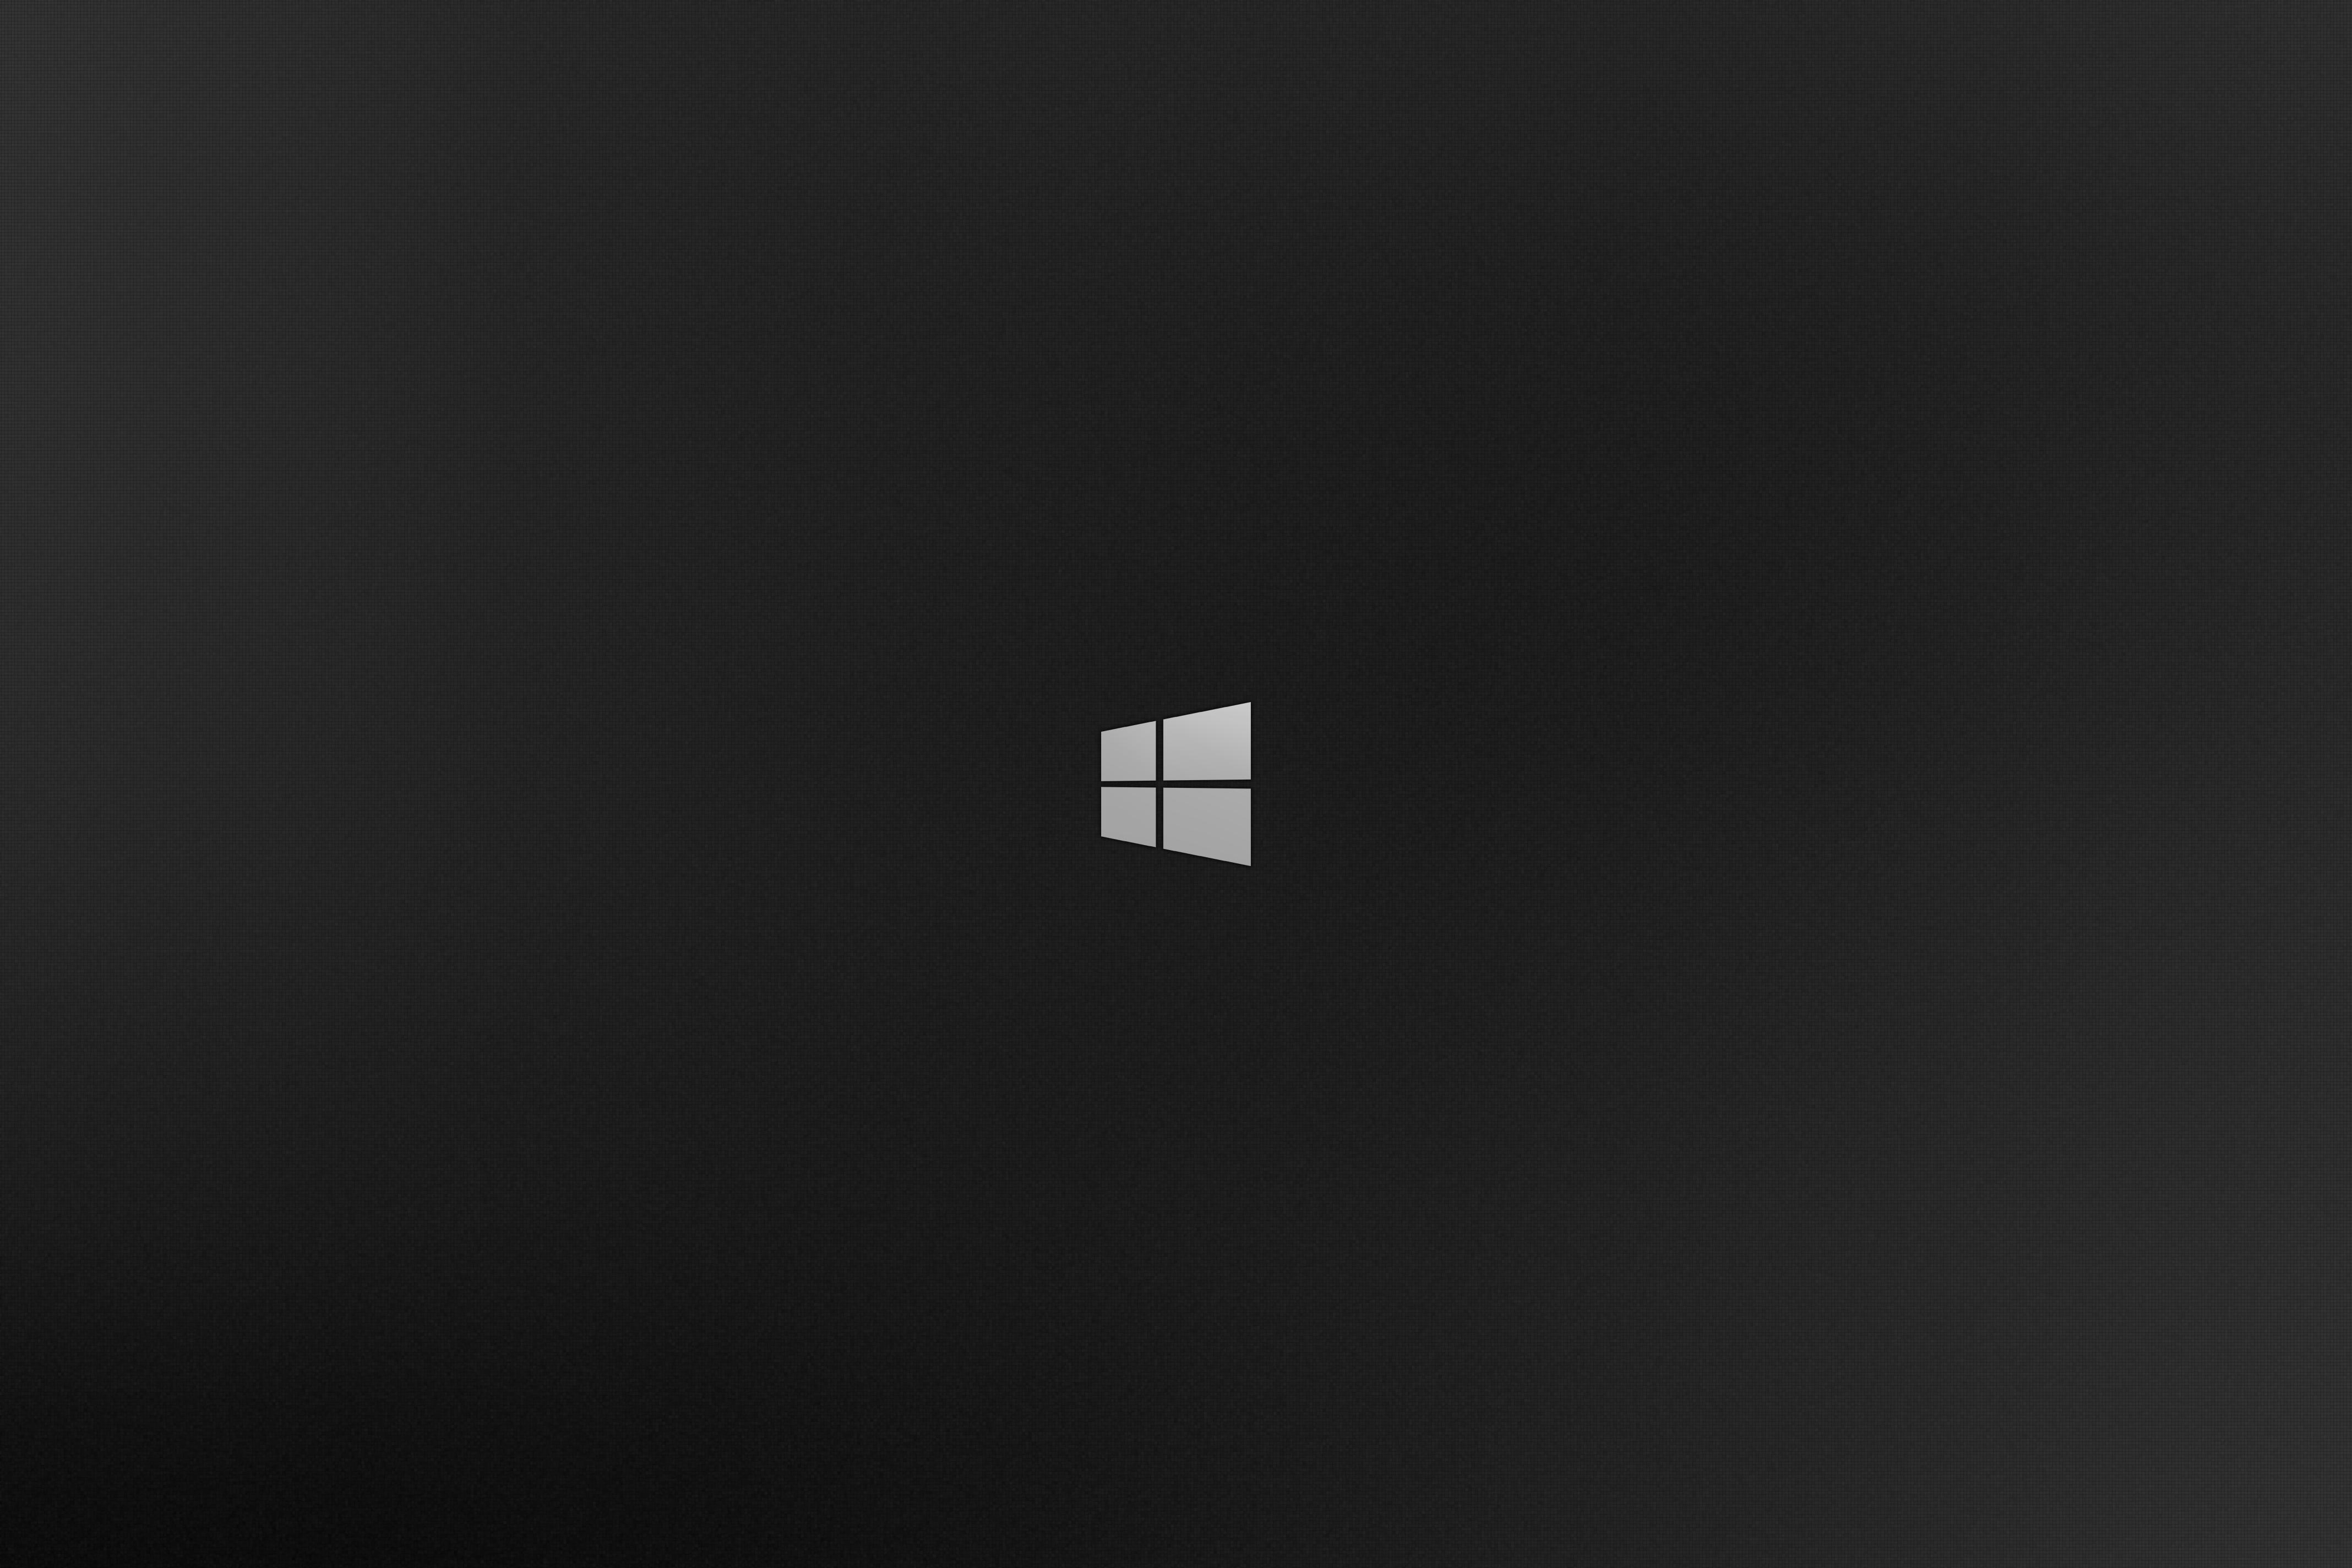 Windows Wallpaper Windows 7 Rich Black Wallpapers Hd Wallpapers